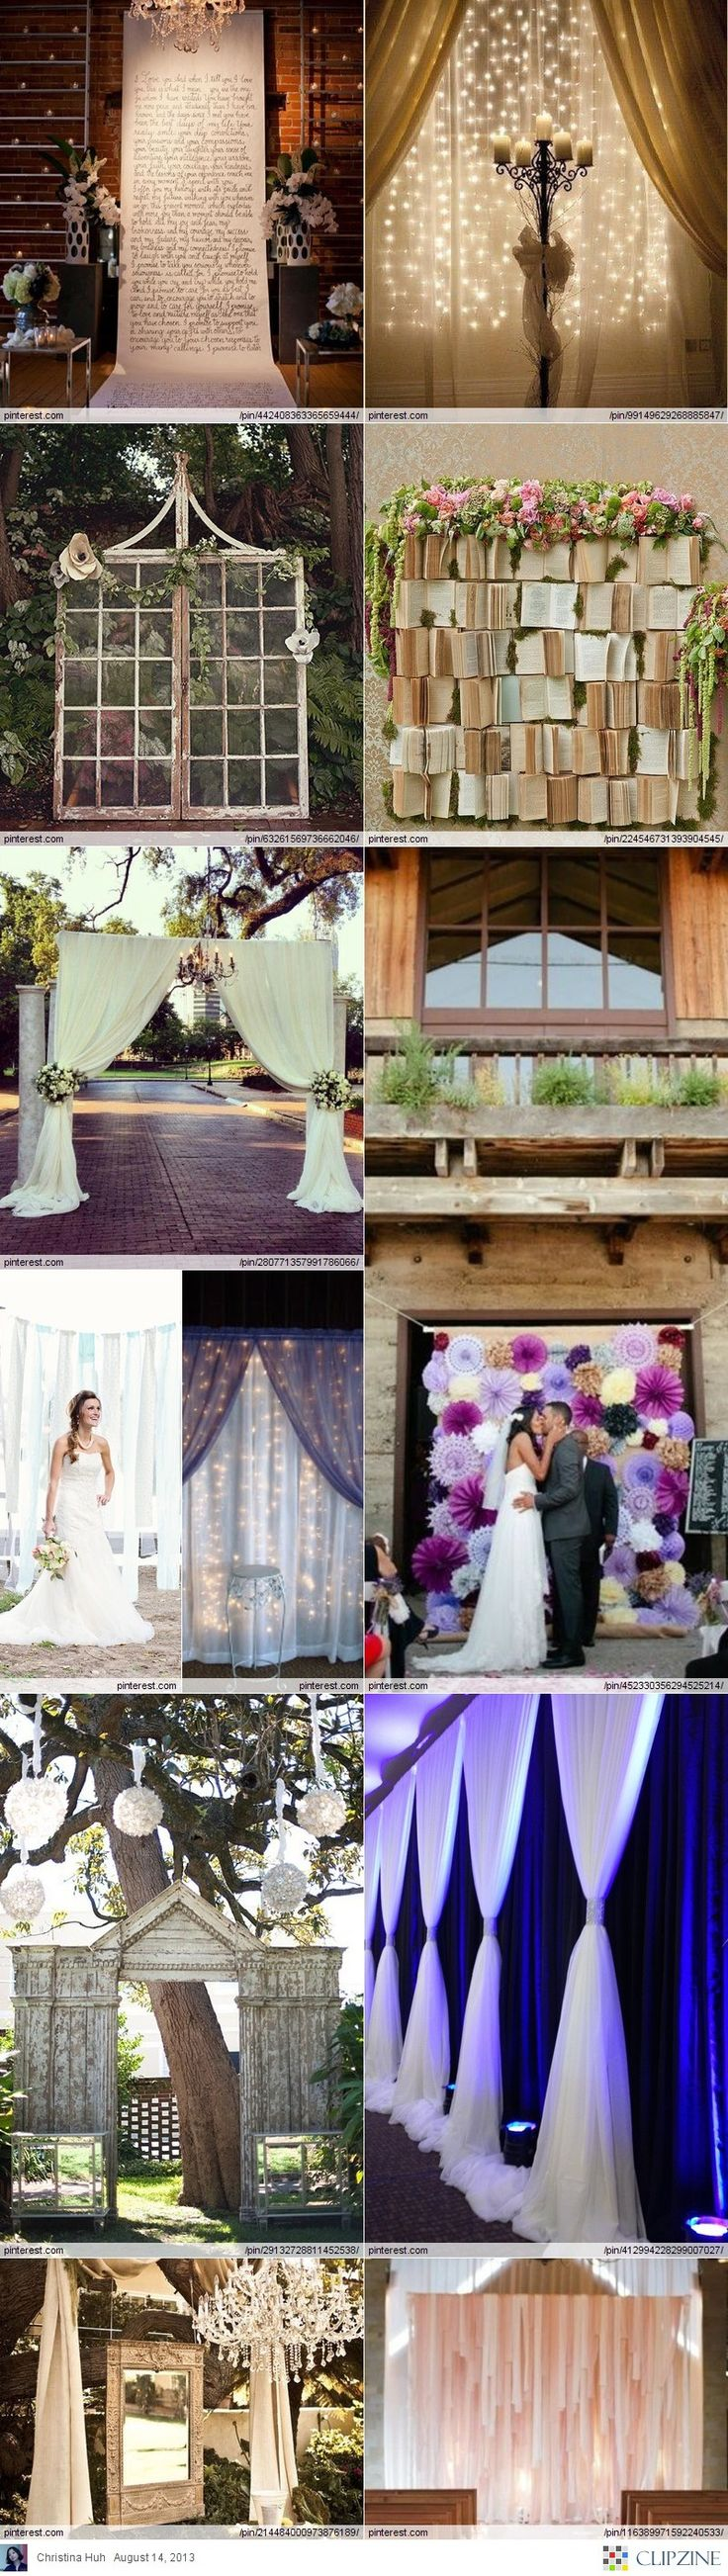 Wedding Backdrop DIY Ideas ***A Book backdrop, how sweet is that??? #wedding #bridal #diy